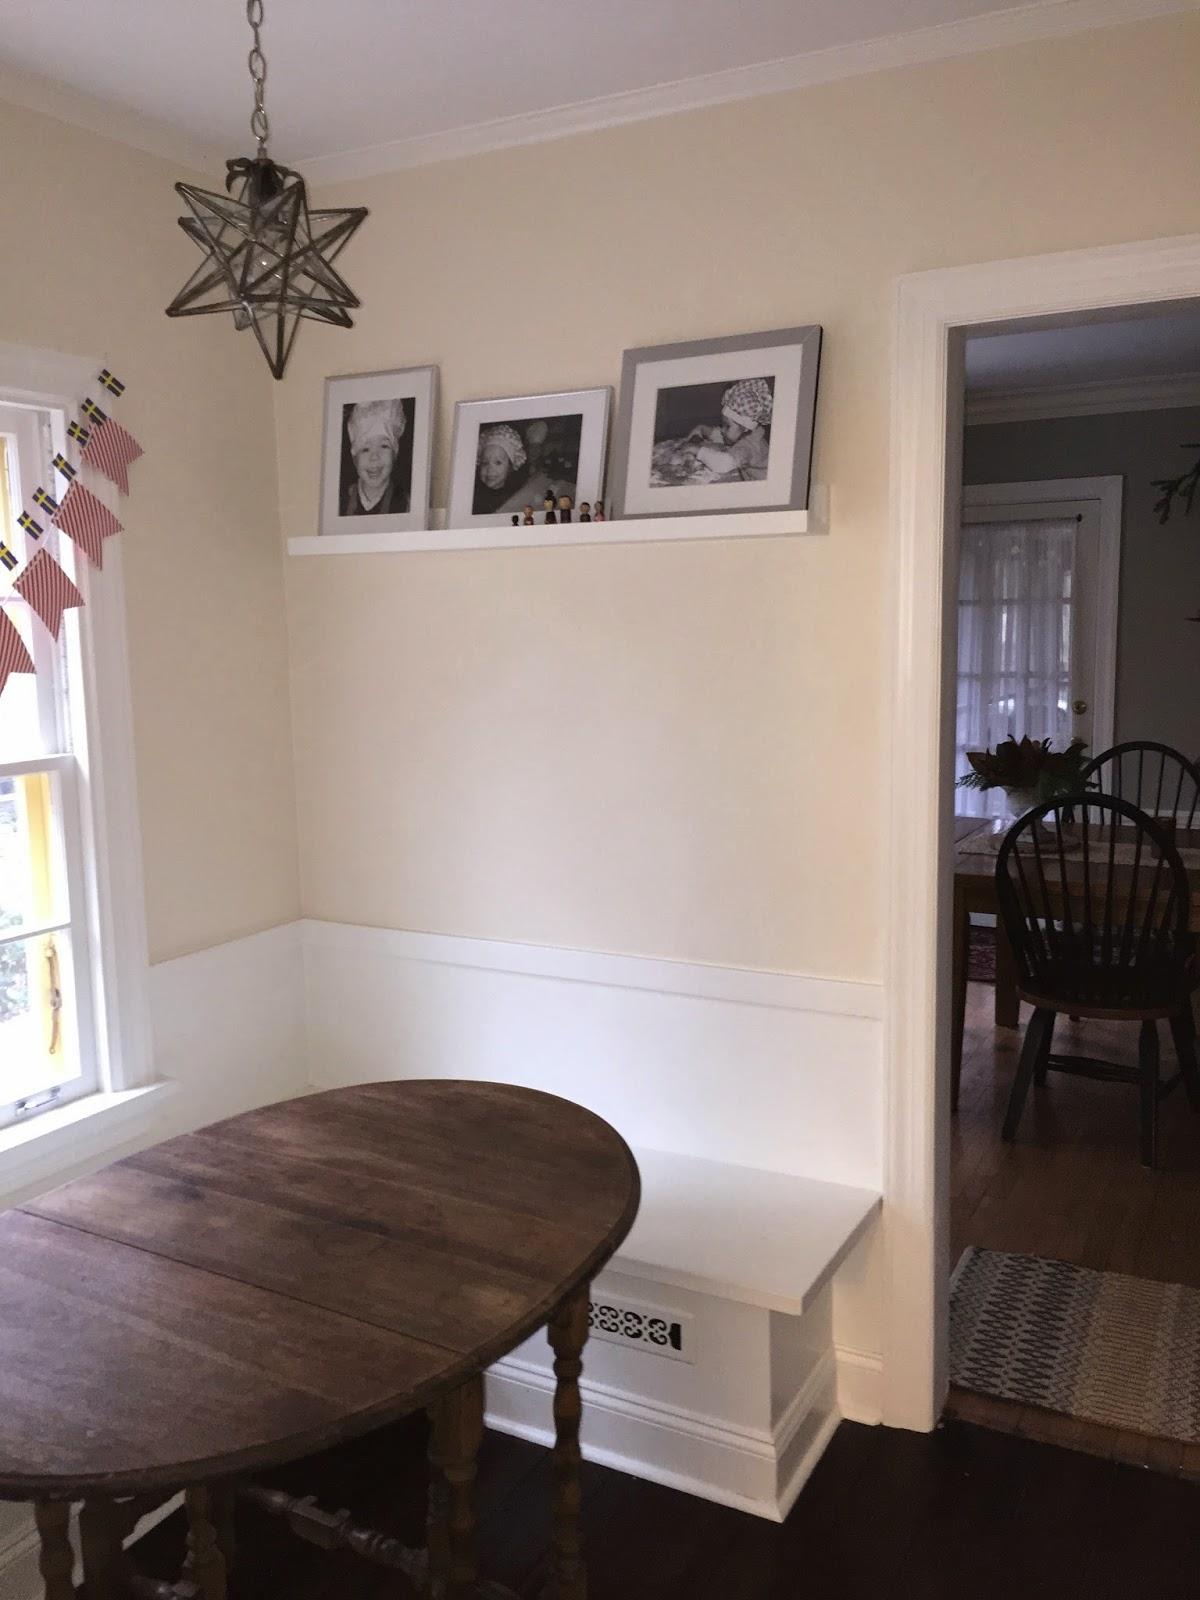 How to make a gallery ledge - how to build a photo shelf - breakfast nook shelf